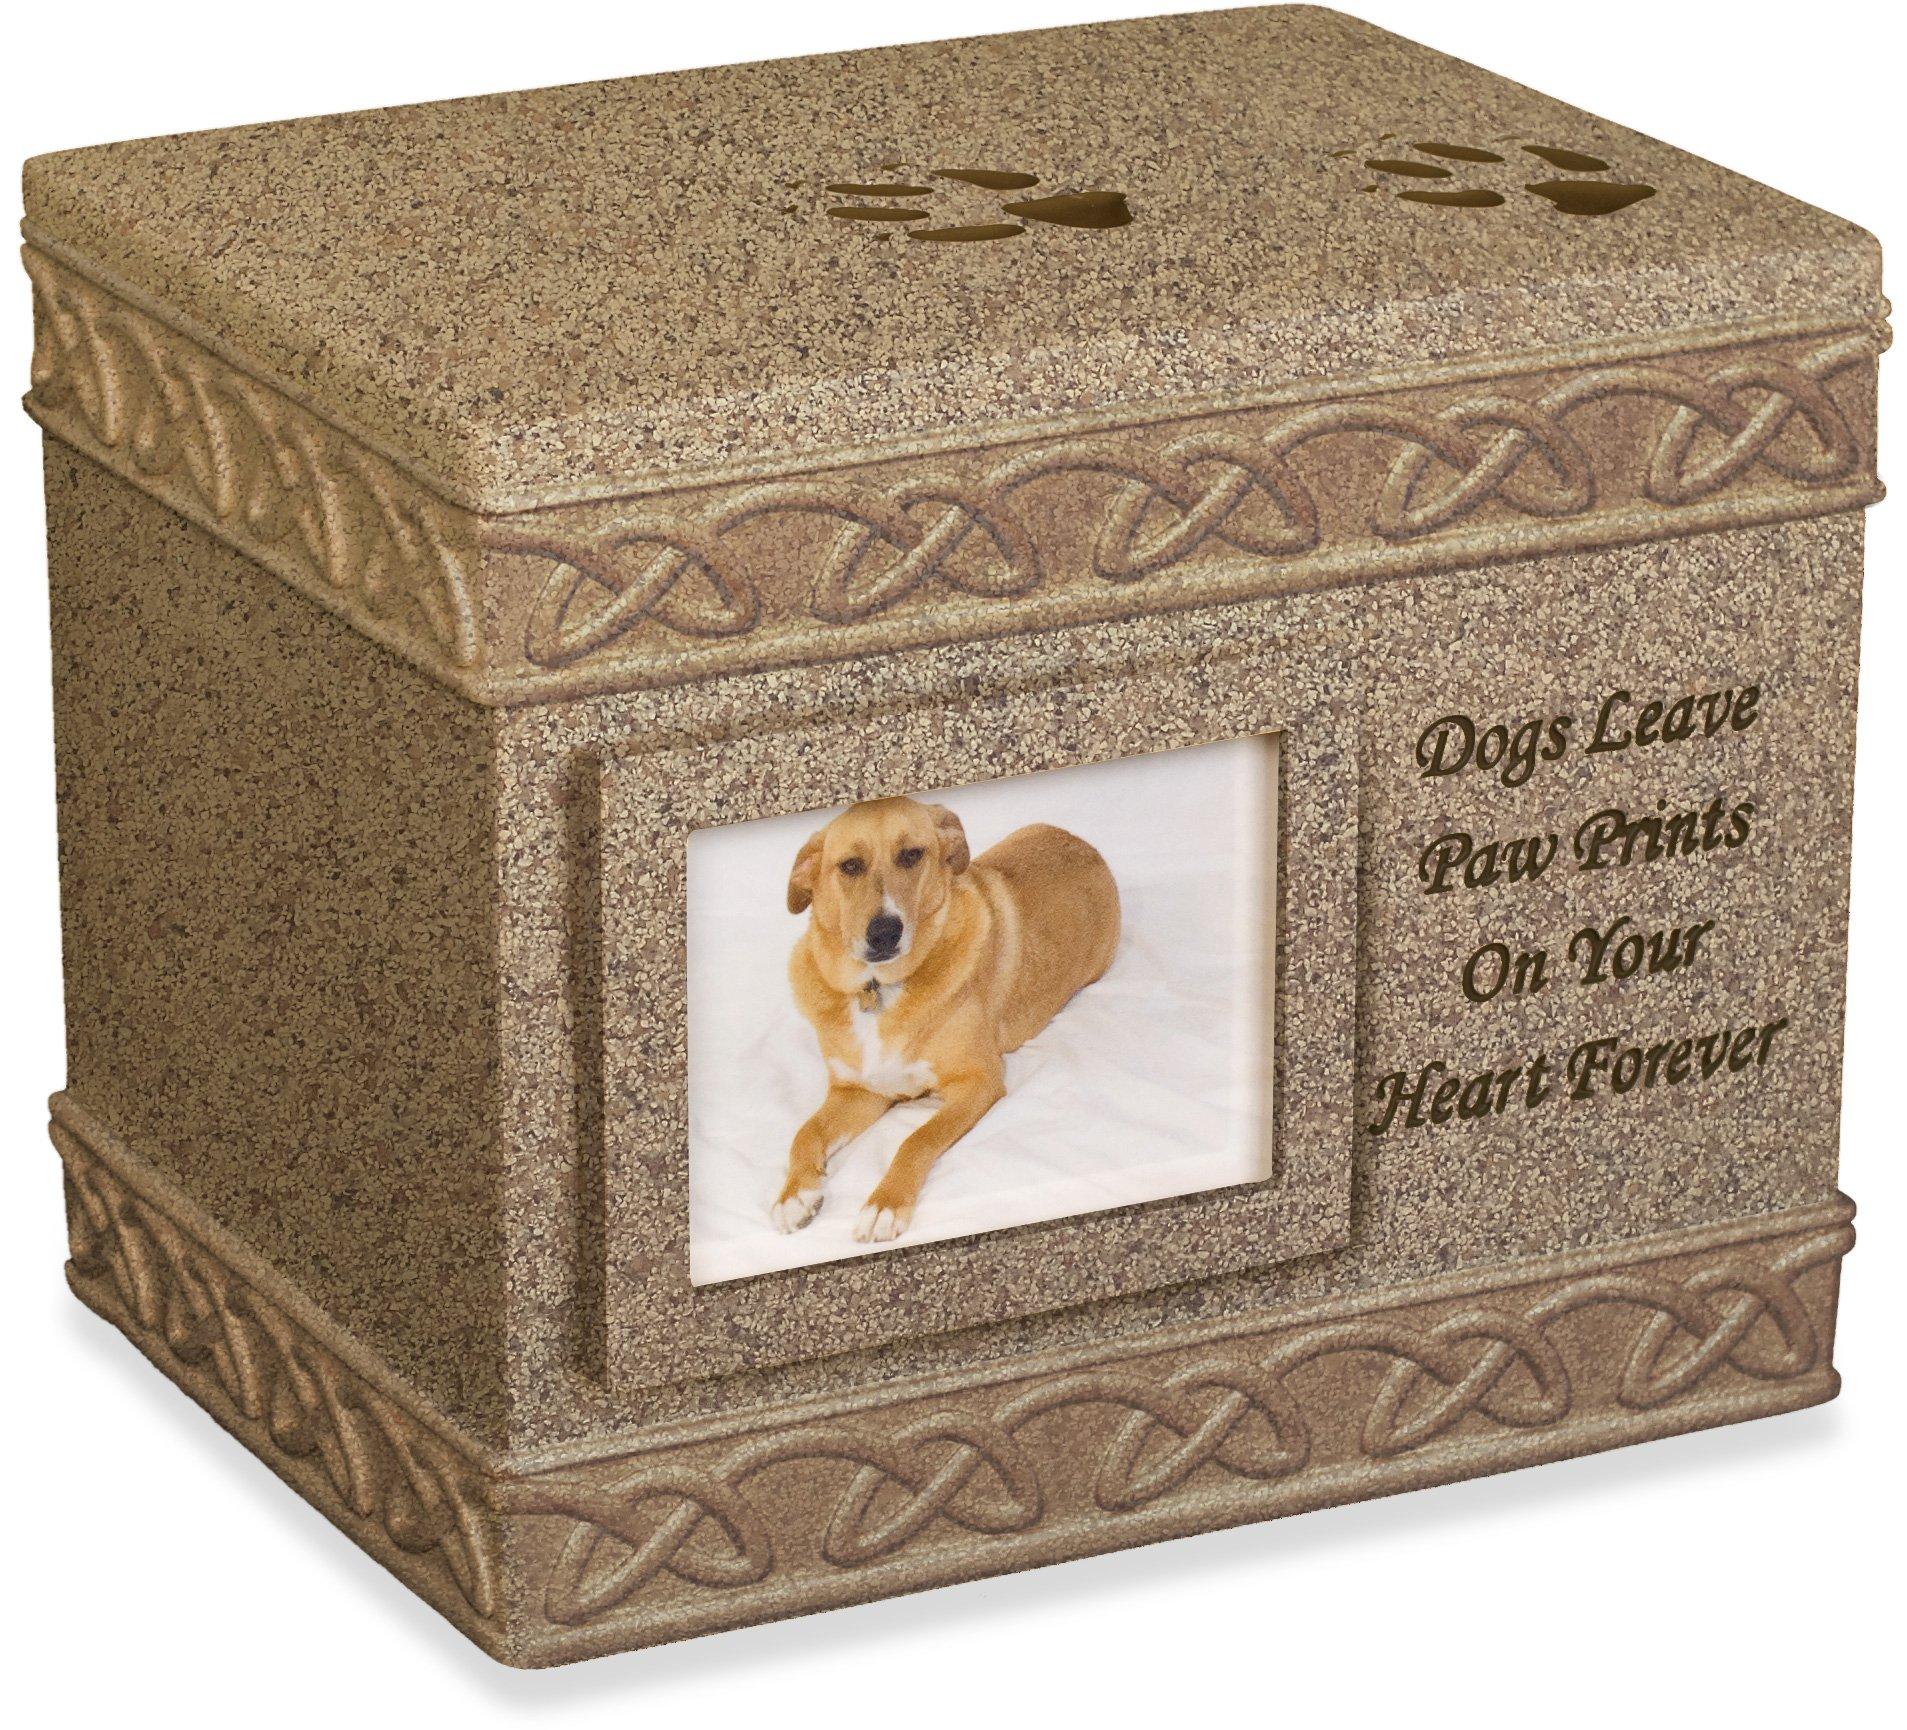 Angel Star 5-Inch Pet Urn for Dog, Dark Brown